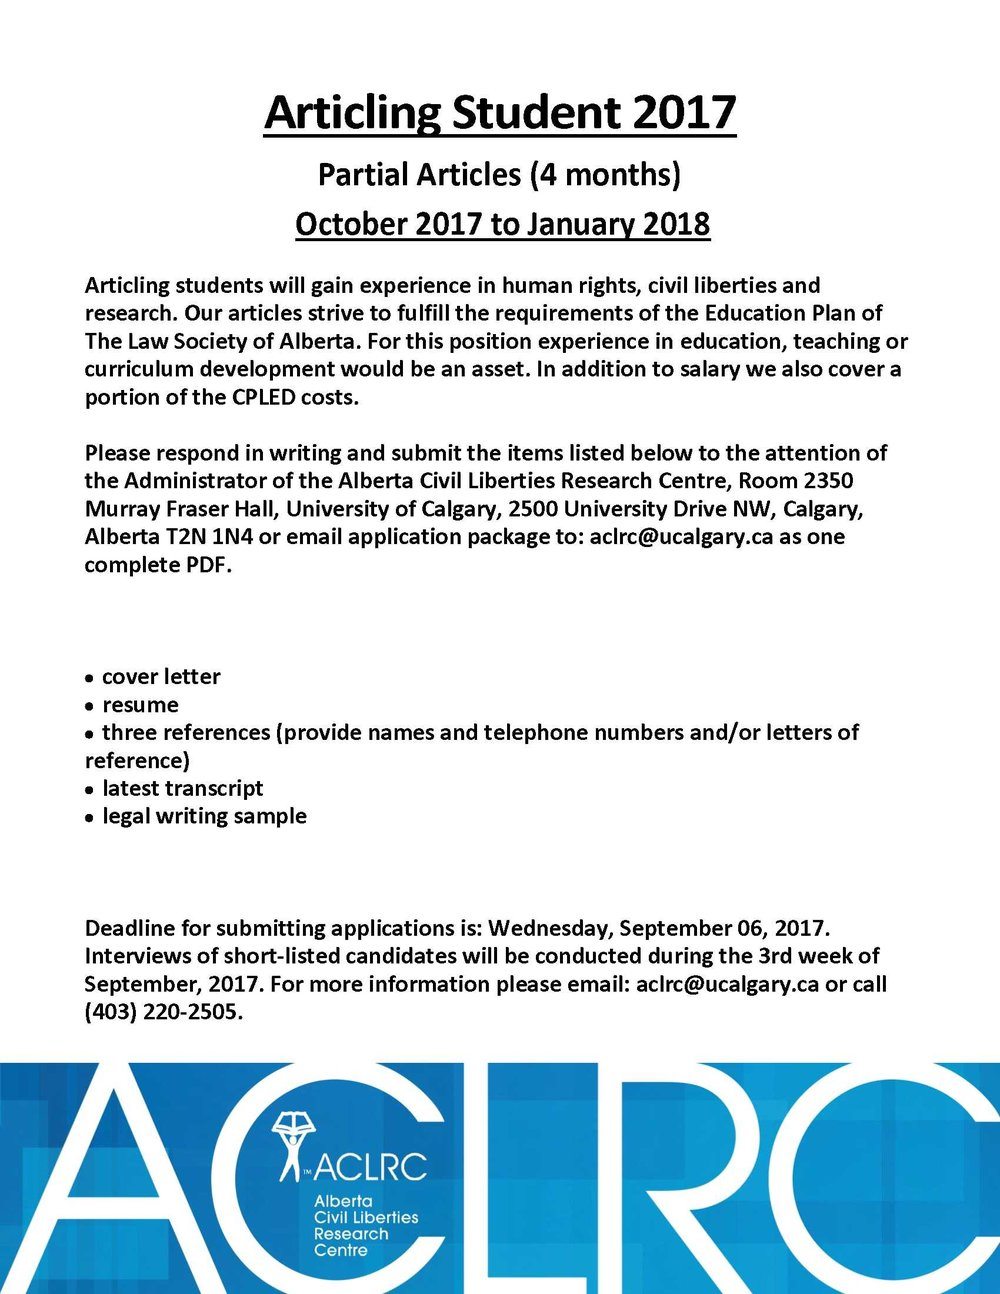 Articling Student job ad Sept 17_1.jpg